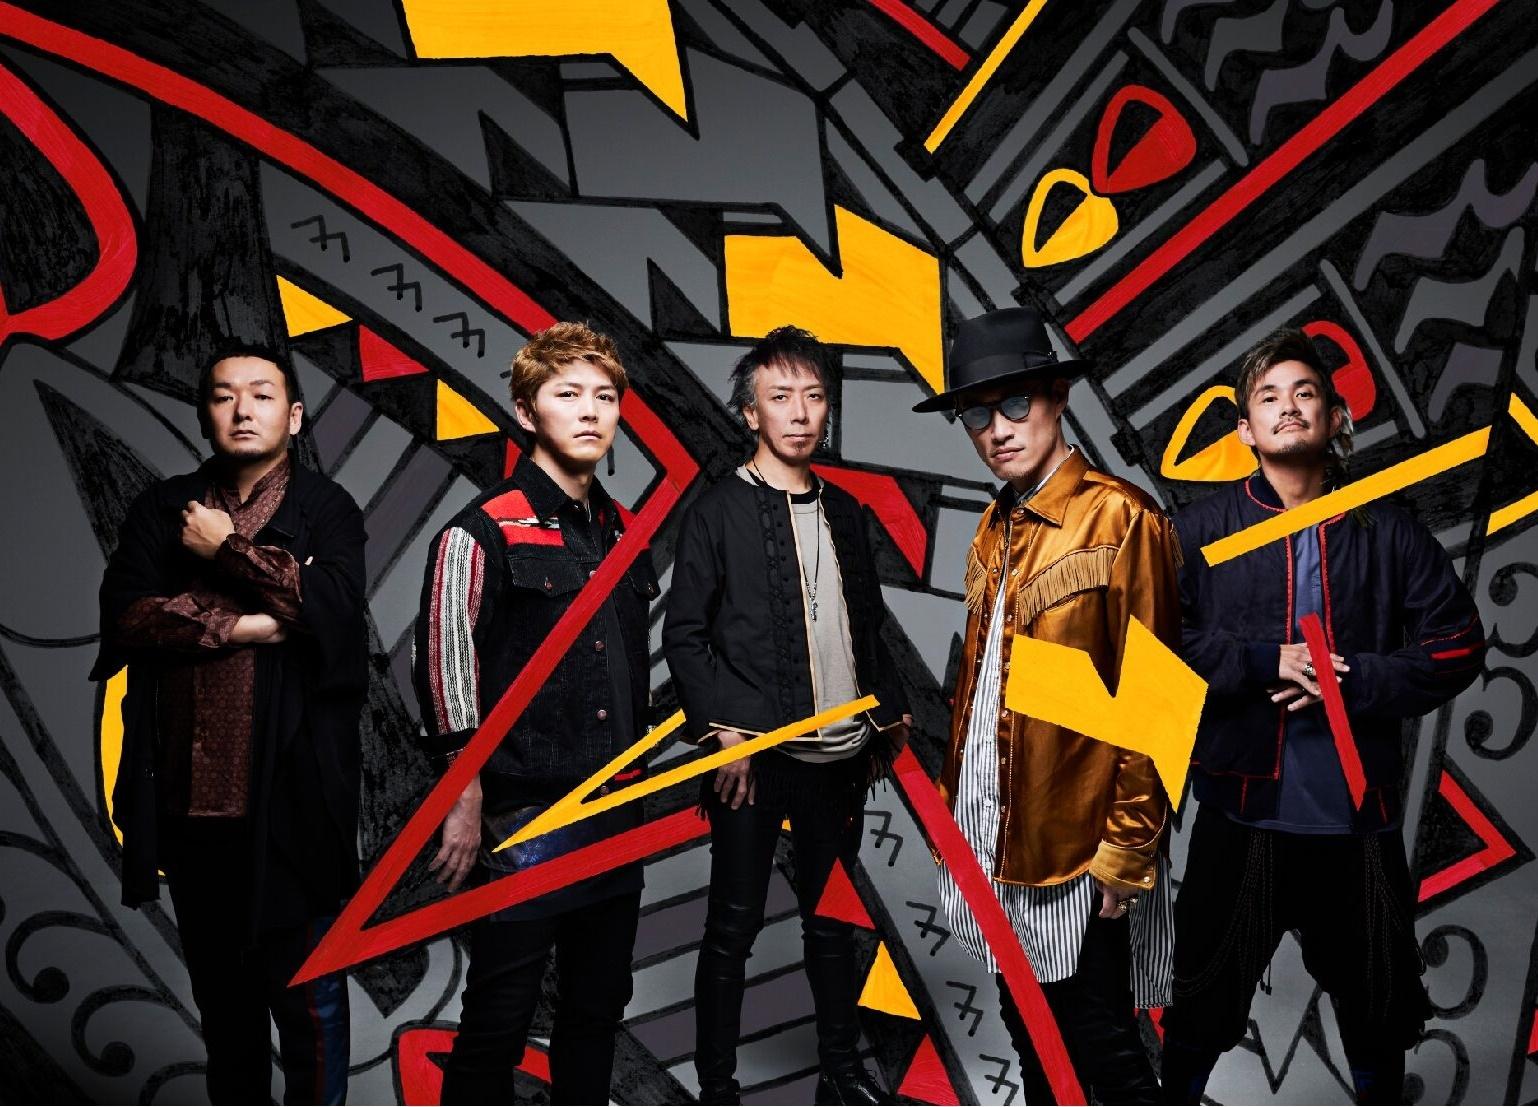 「FLOW 超会議 2020 ~アニメ縛りリターンズ~」2月24日 開催決定